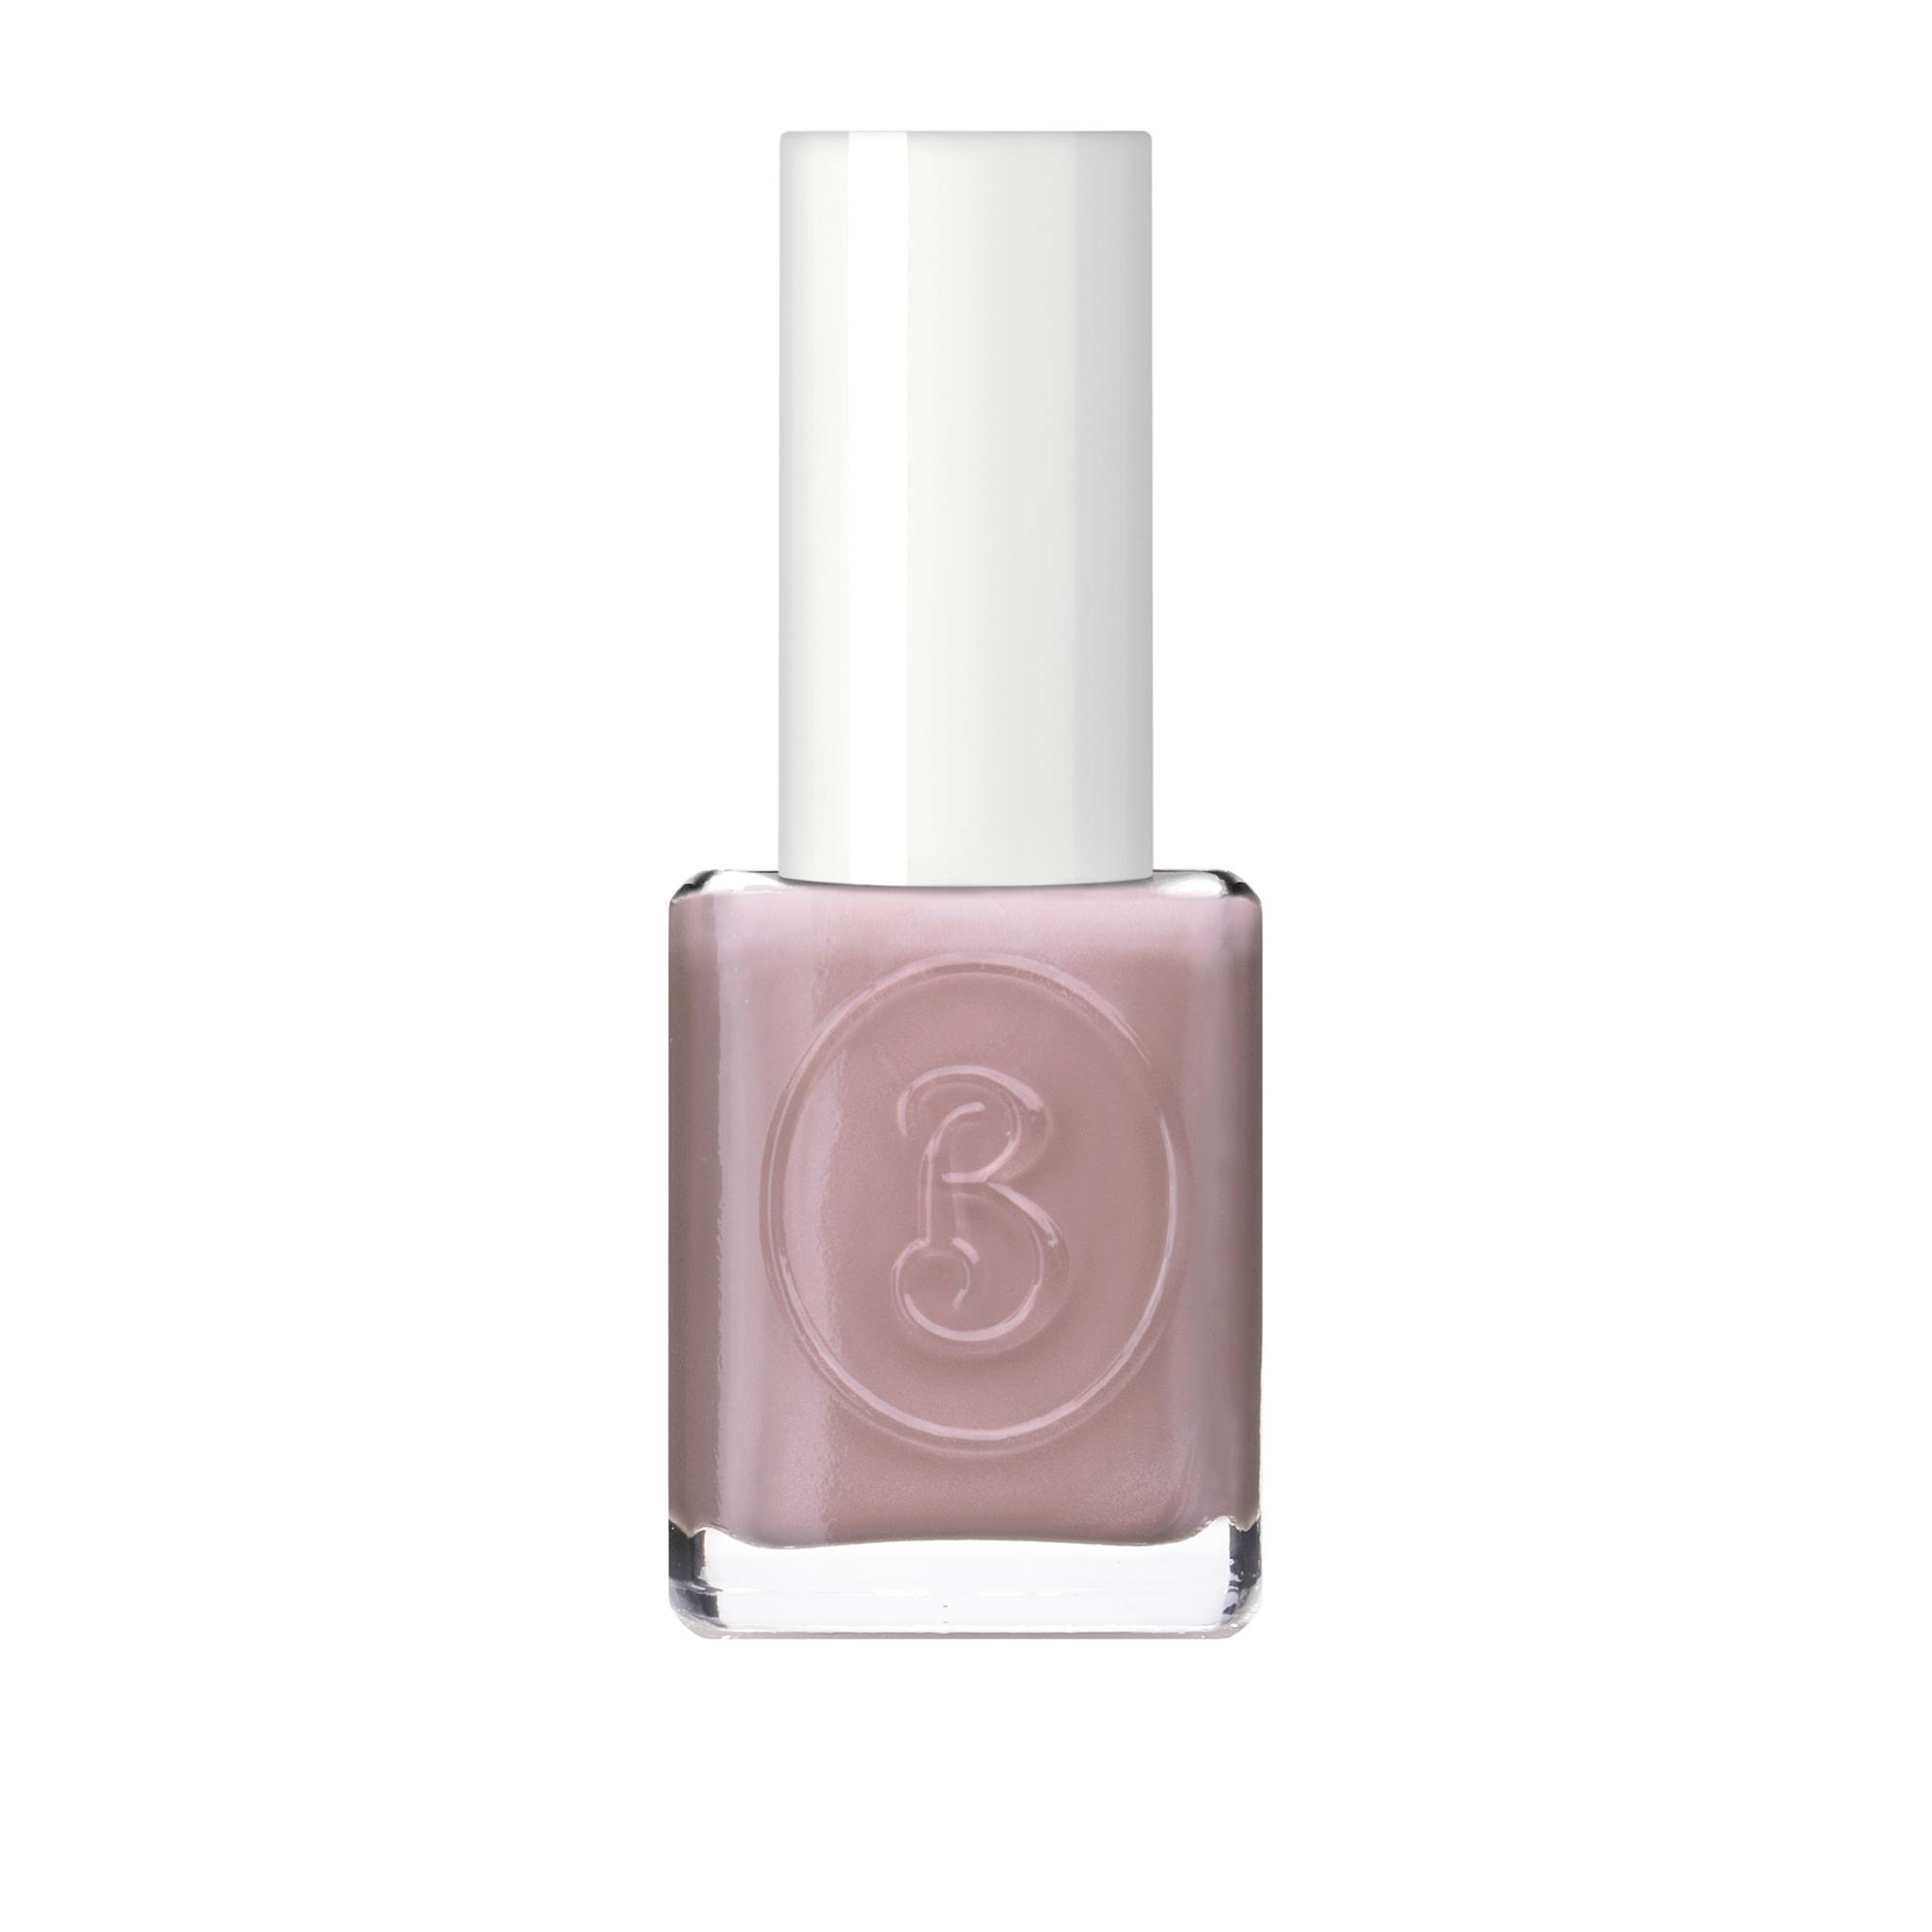 BERENICE 31 лак для ногтей, бутон розы / Rose bud 16 мл berenice 53 лак для ногтей рыжая лиса red fox 16 мл